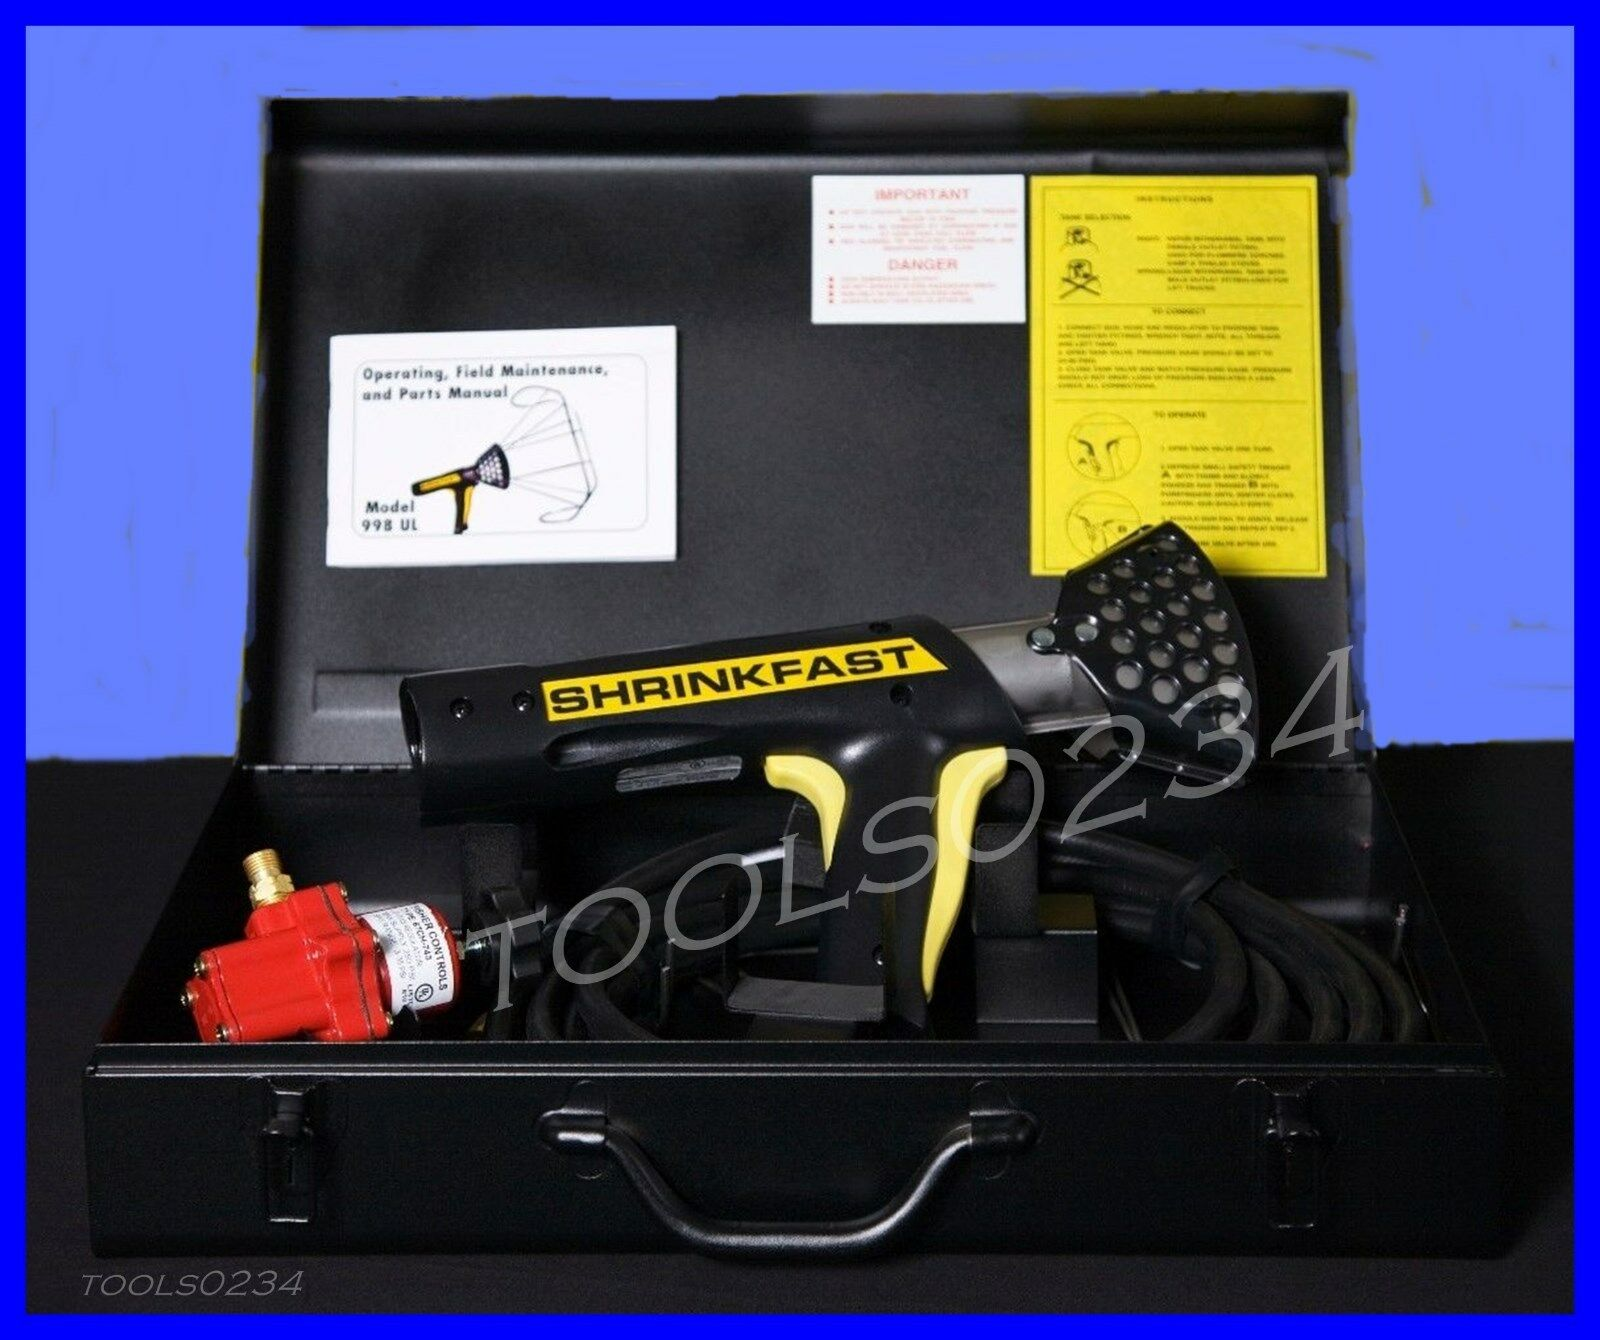 Shrinkfast 998 Psy rapide propane Wrap Film Heat Gun Free Ship US48 États nouveau